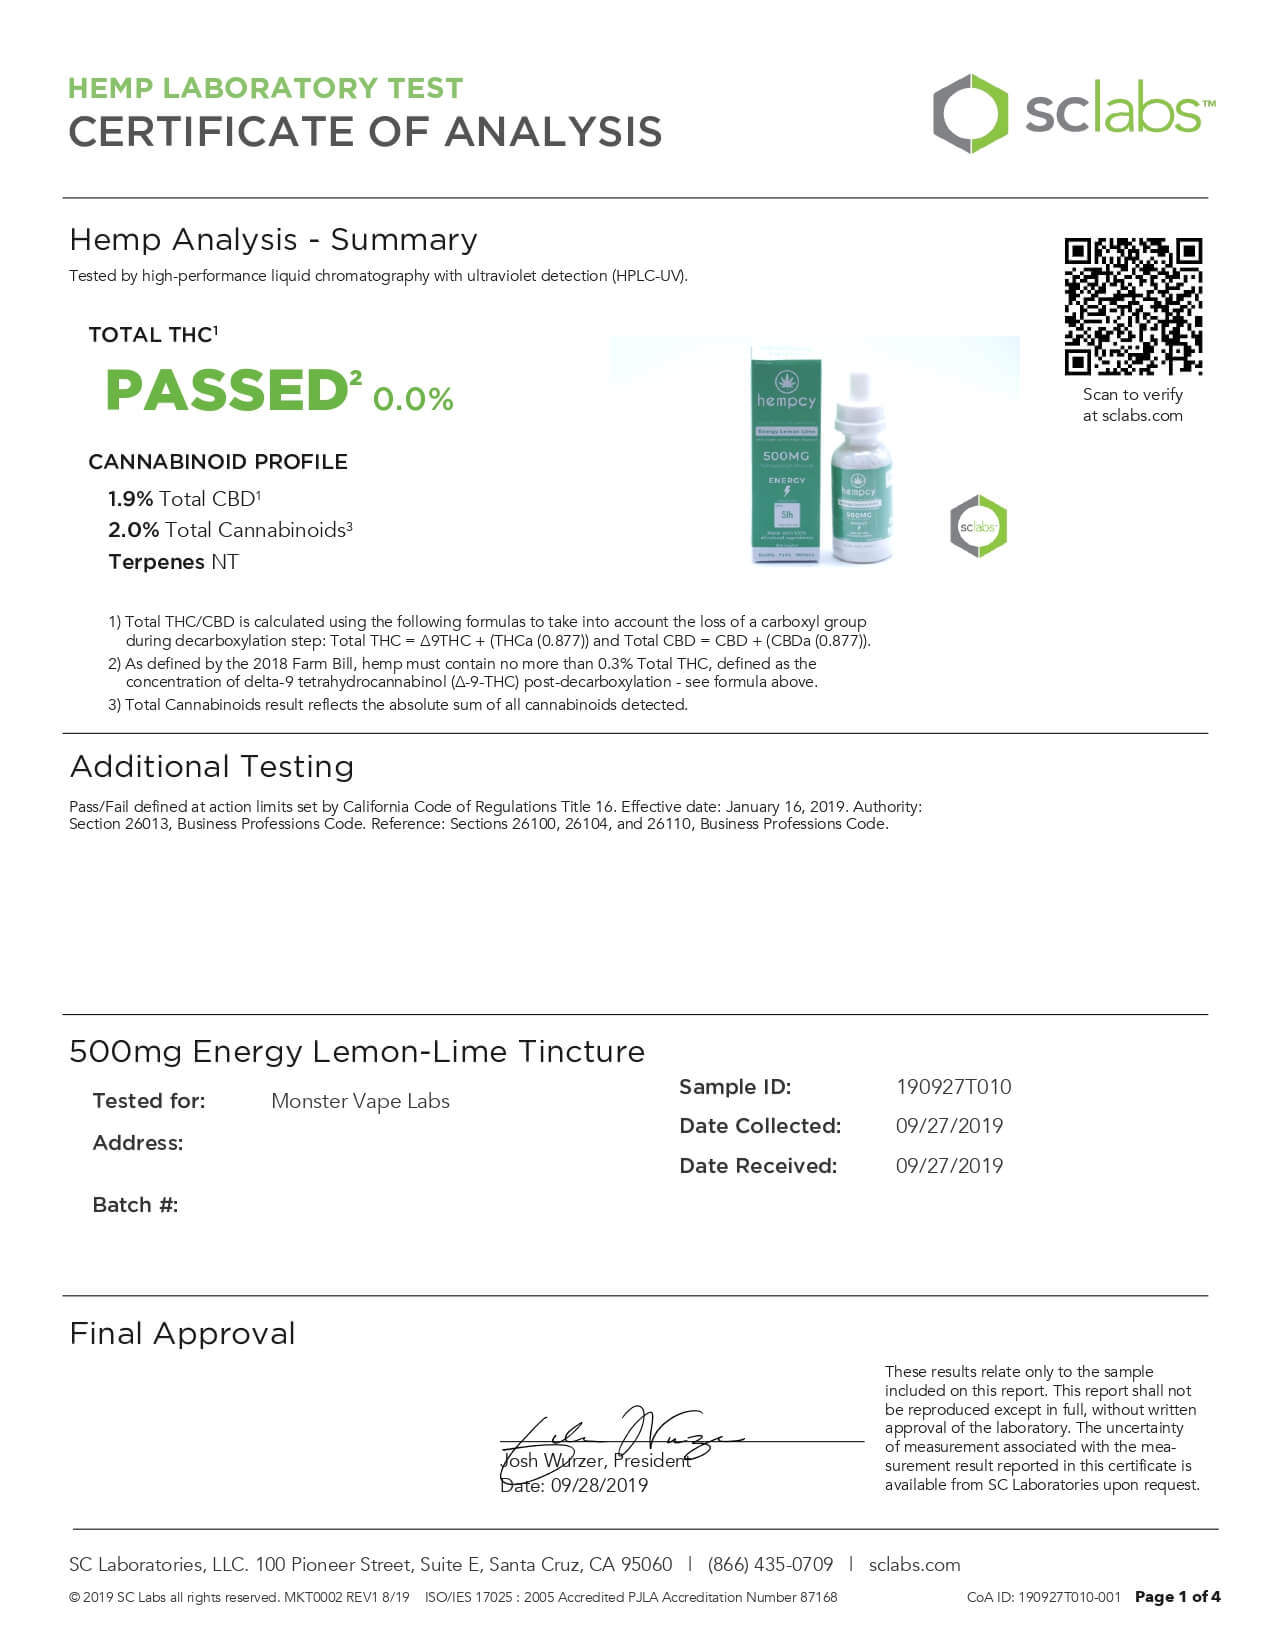 Hempcy CBD Tincture Energy Lemon Lime 500mg Lab Report